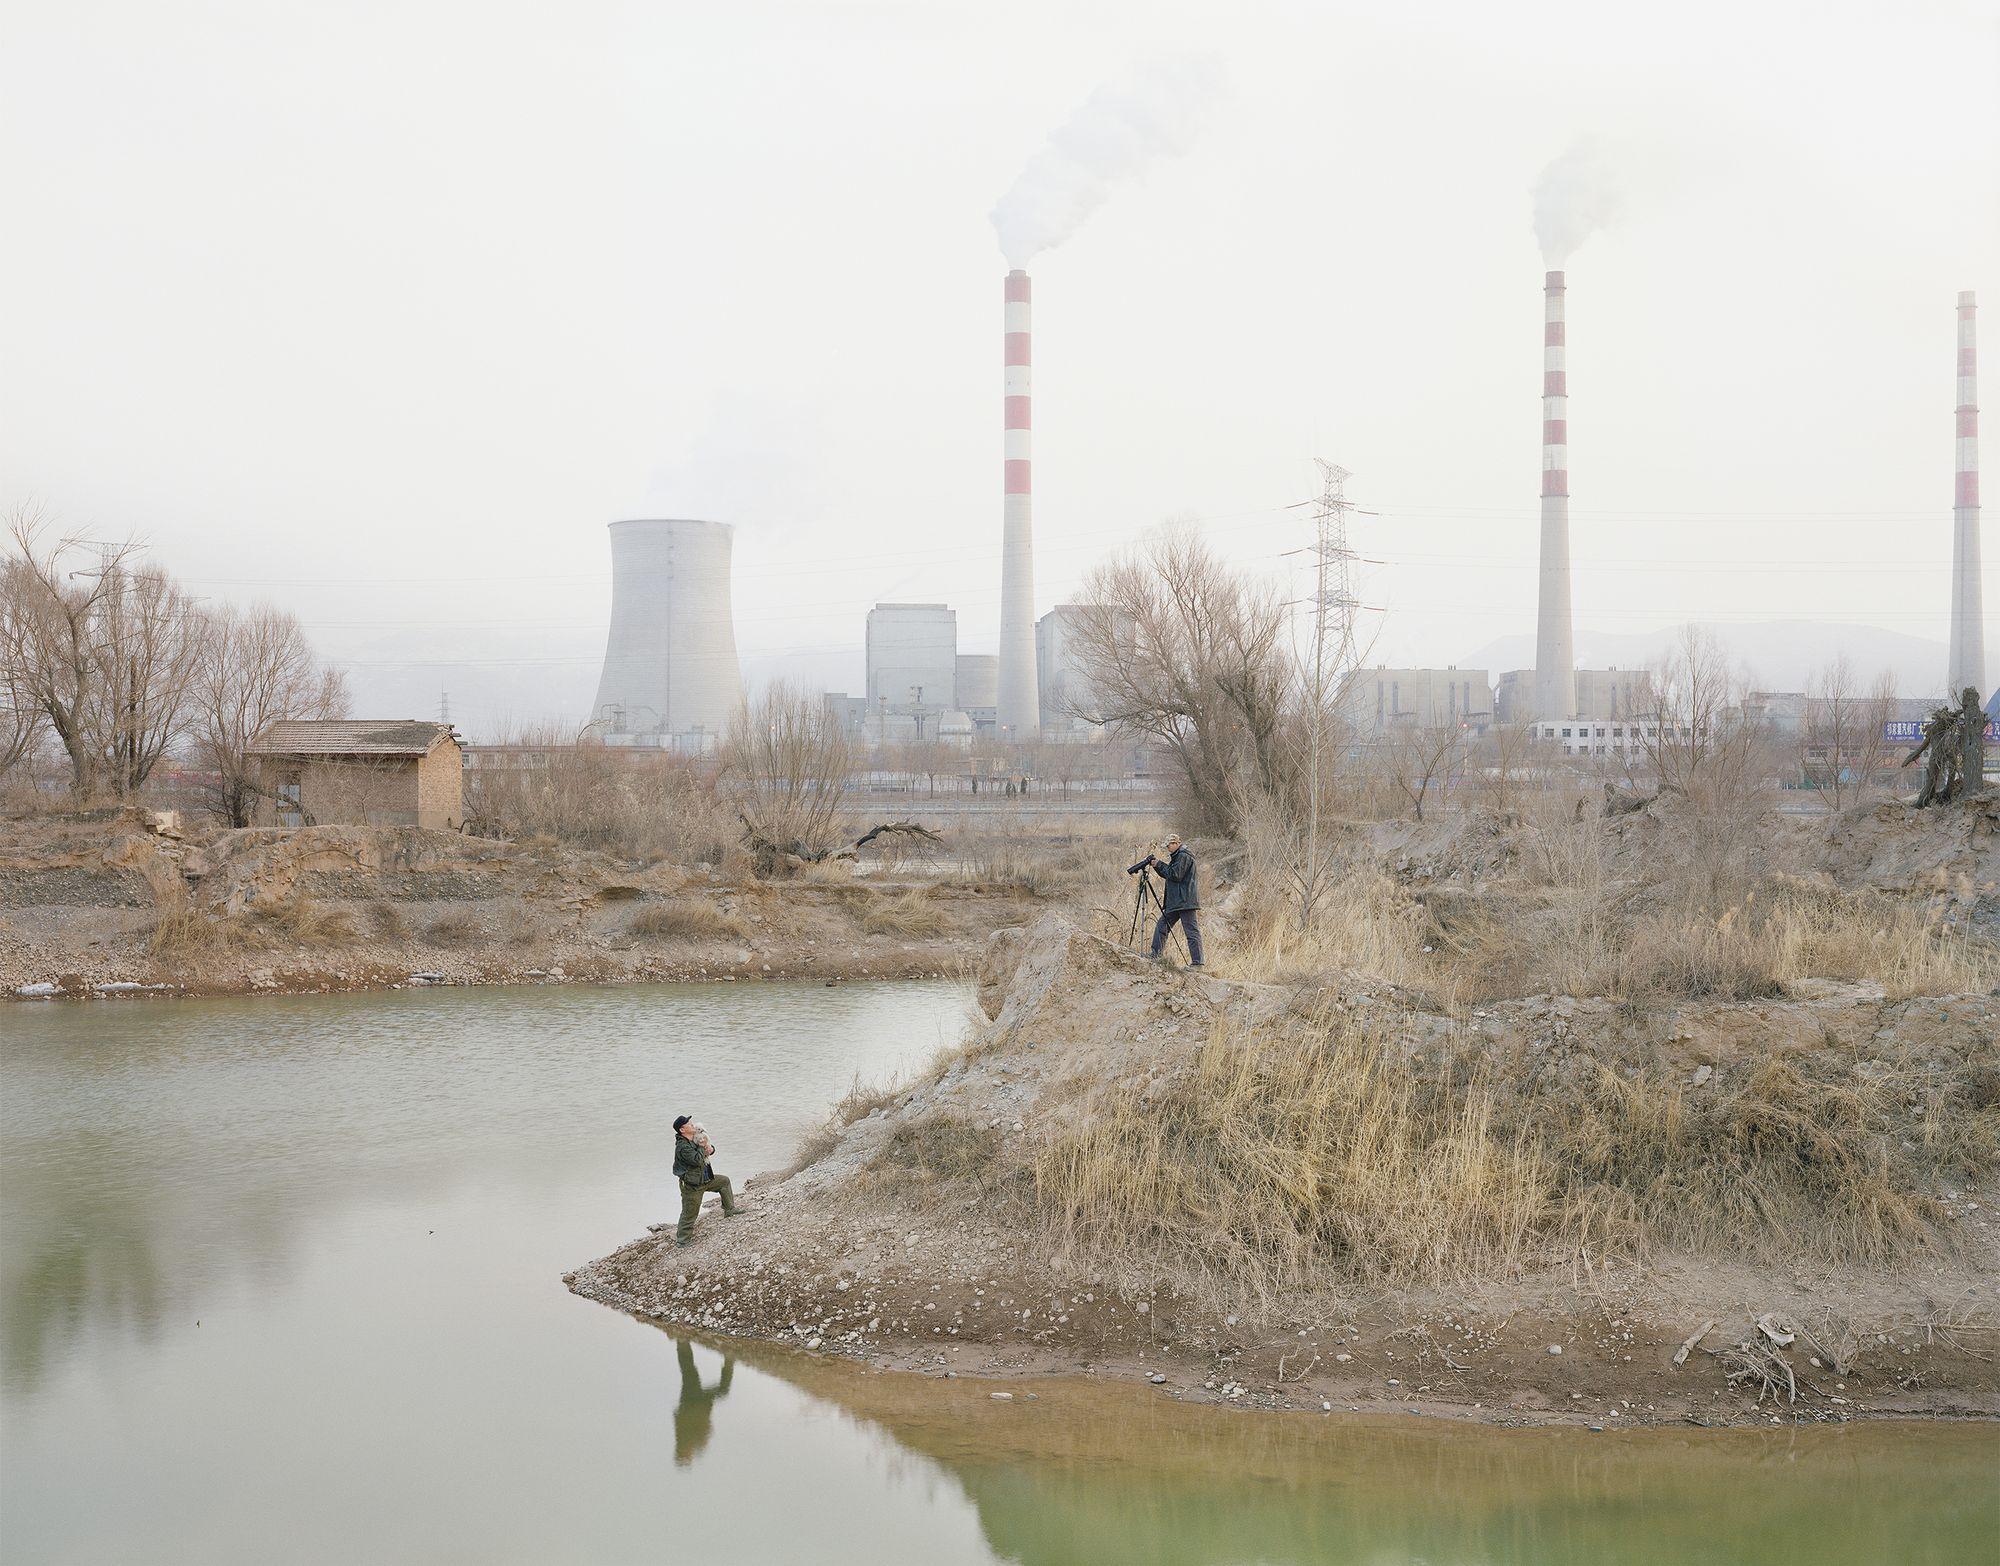 Zhang Kechun – A man photographing by the river, Gansu province